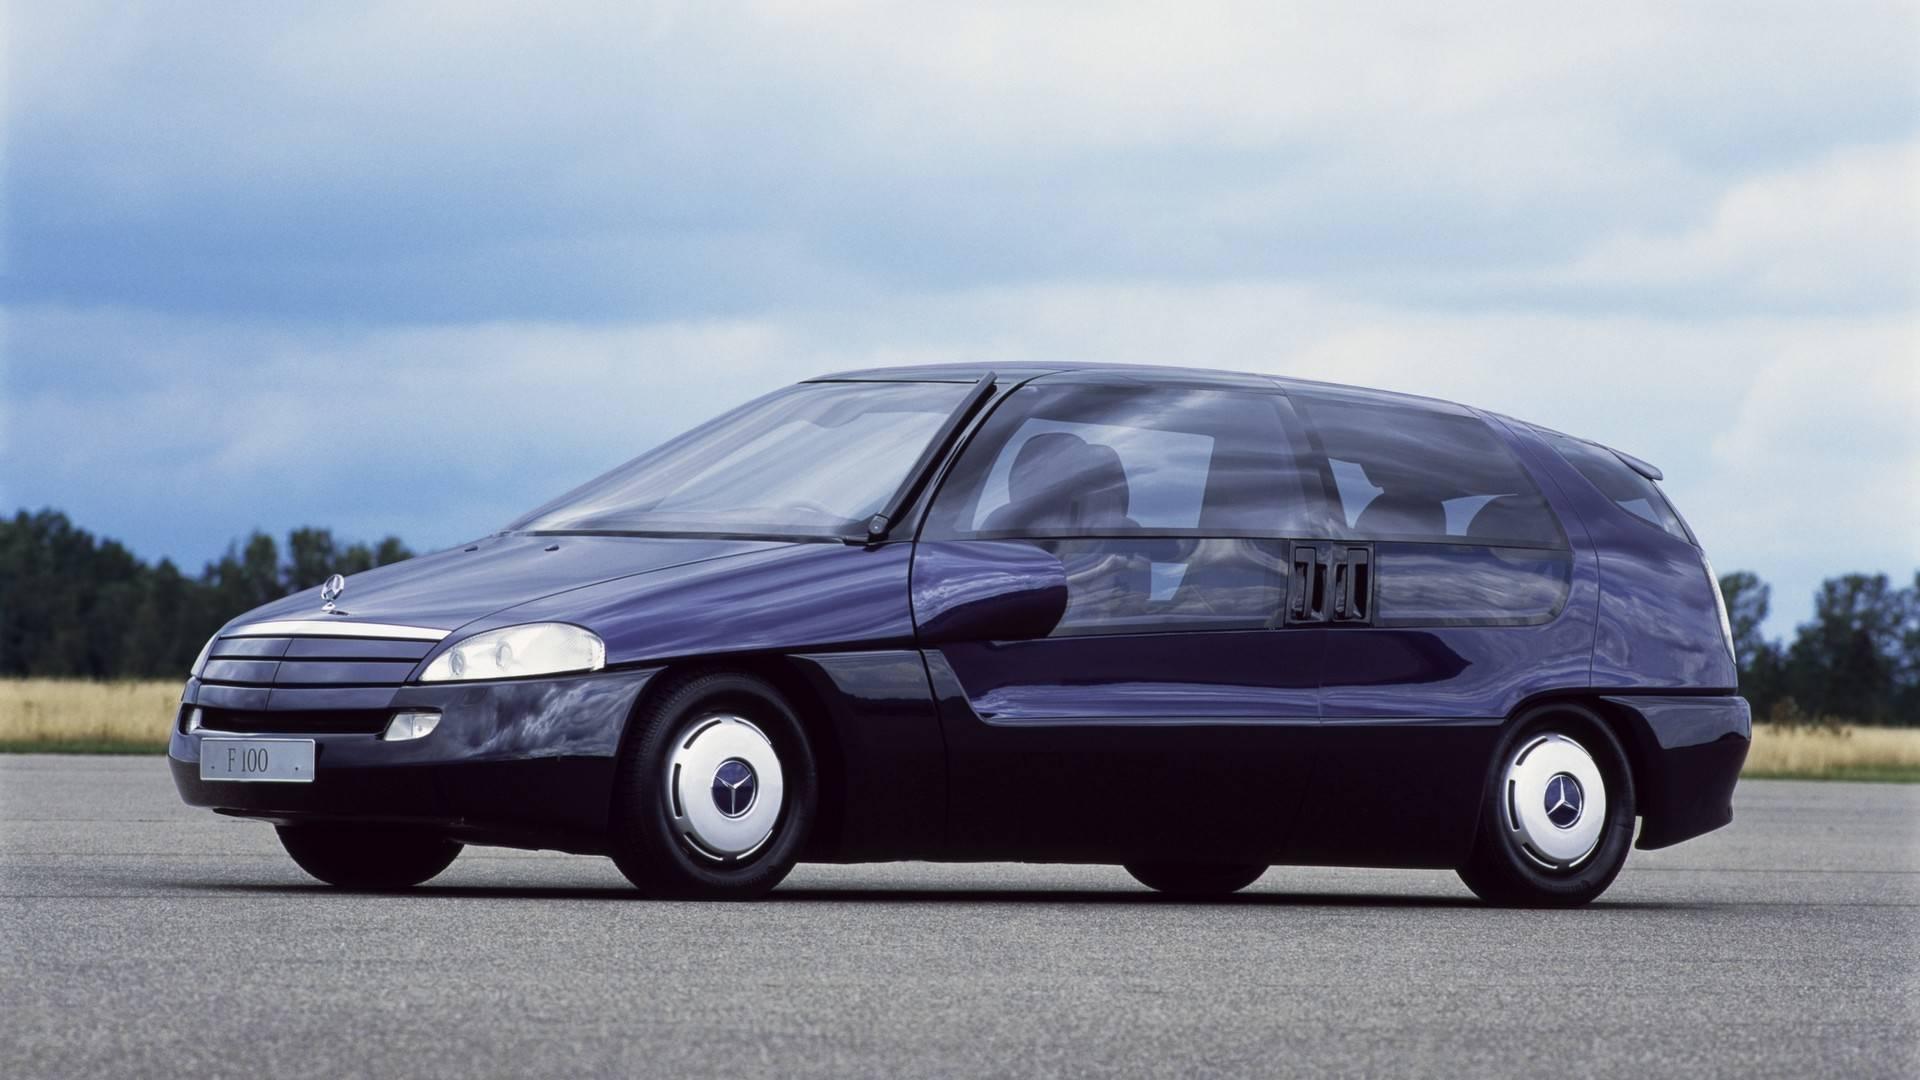 5a6887bcc04fb 1991 mercedes f100 concept مرسدس F100 مدل ۱۹۹۱ نقد و بررسی این خودرو زیبا   اجاره ماشین